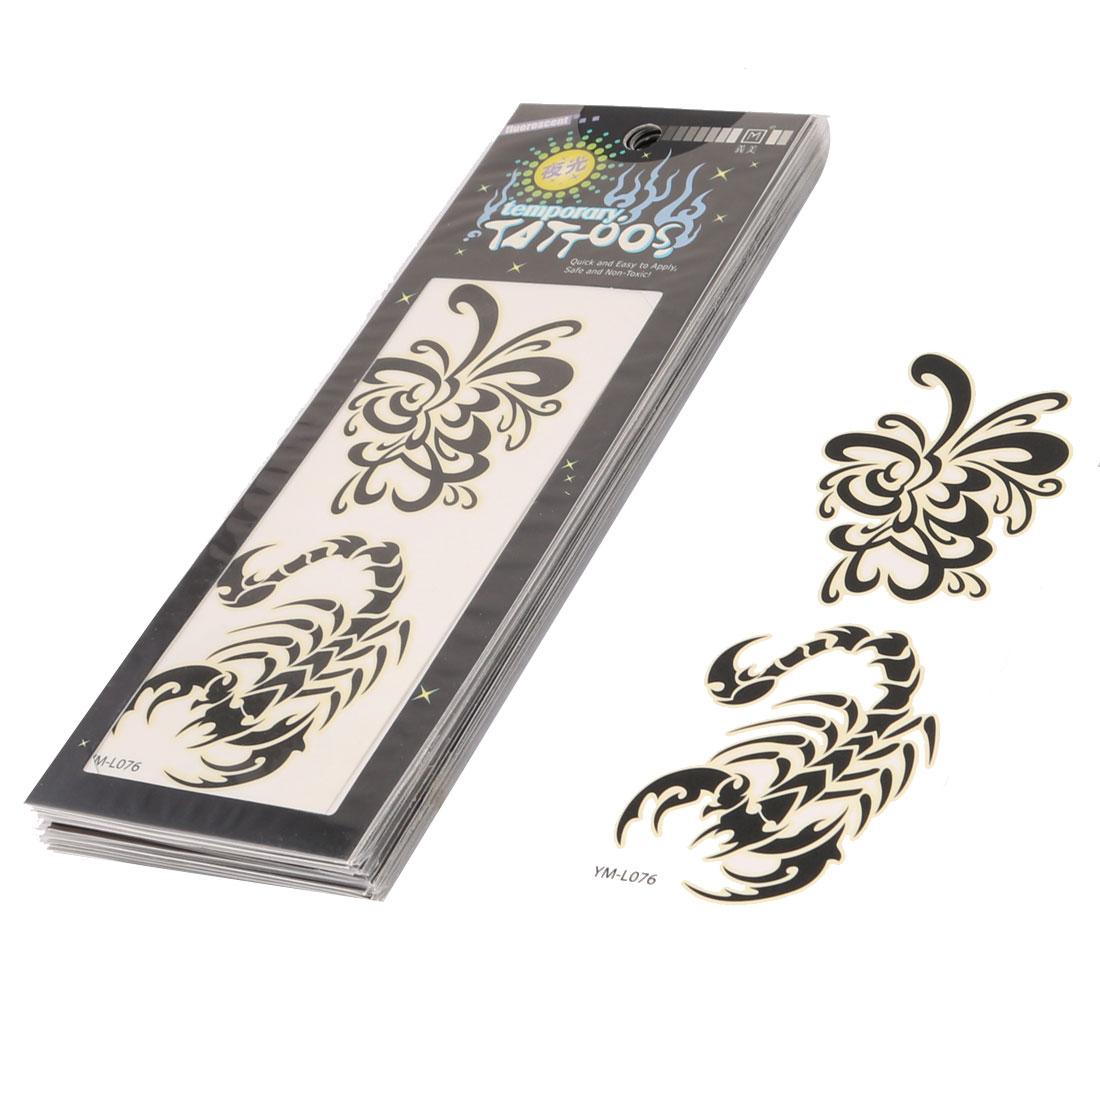 Ink Scorpion Flower Pattern Transfer Temporary Tattoo Sticker Black 10 Pcs